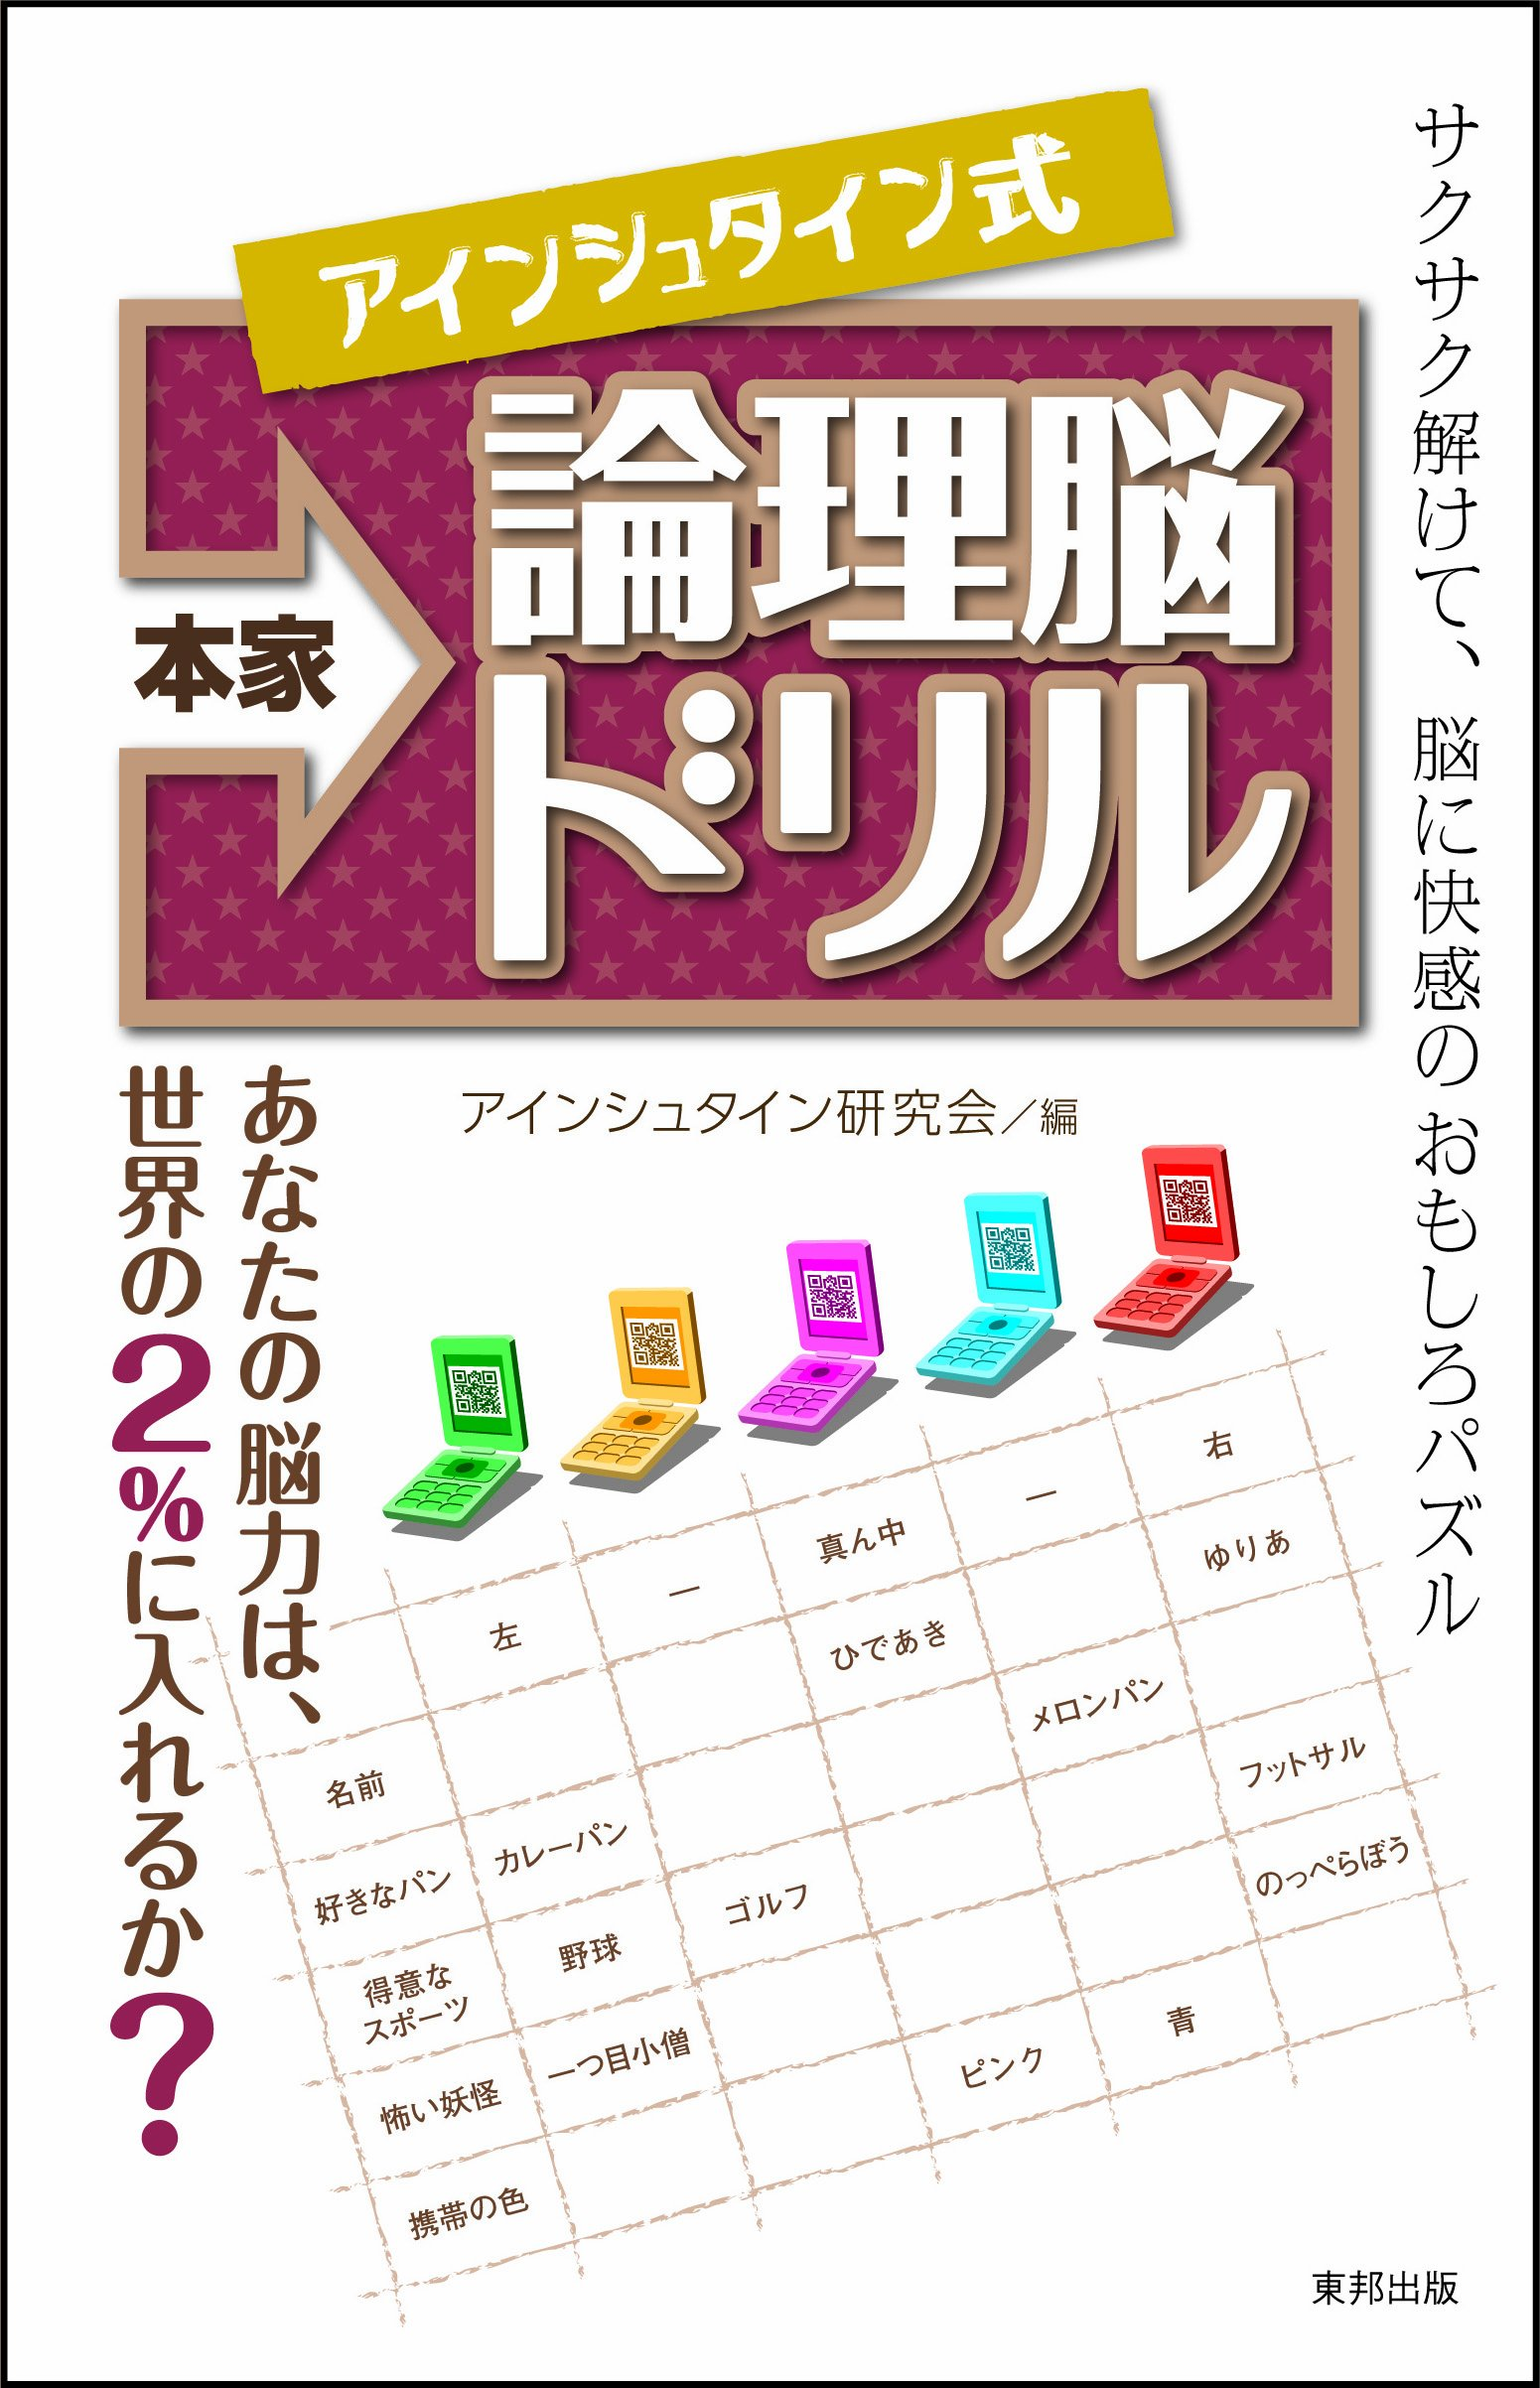 Download Honke ainshutainshiki ronrinō doriru pdf epub